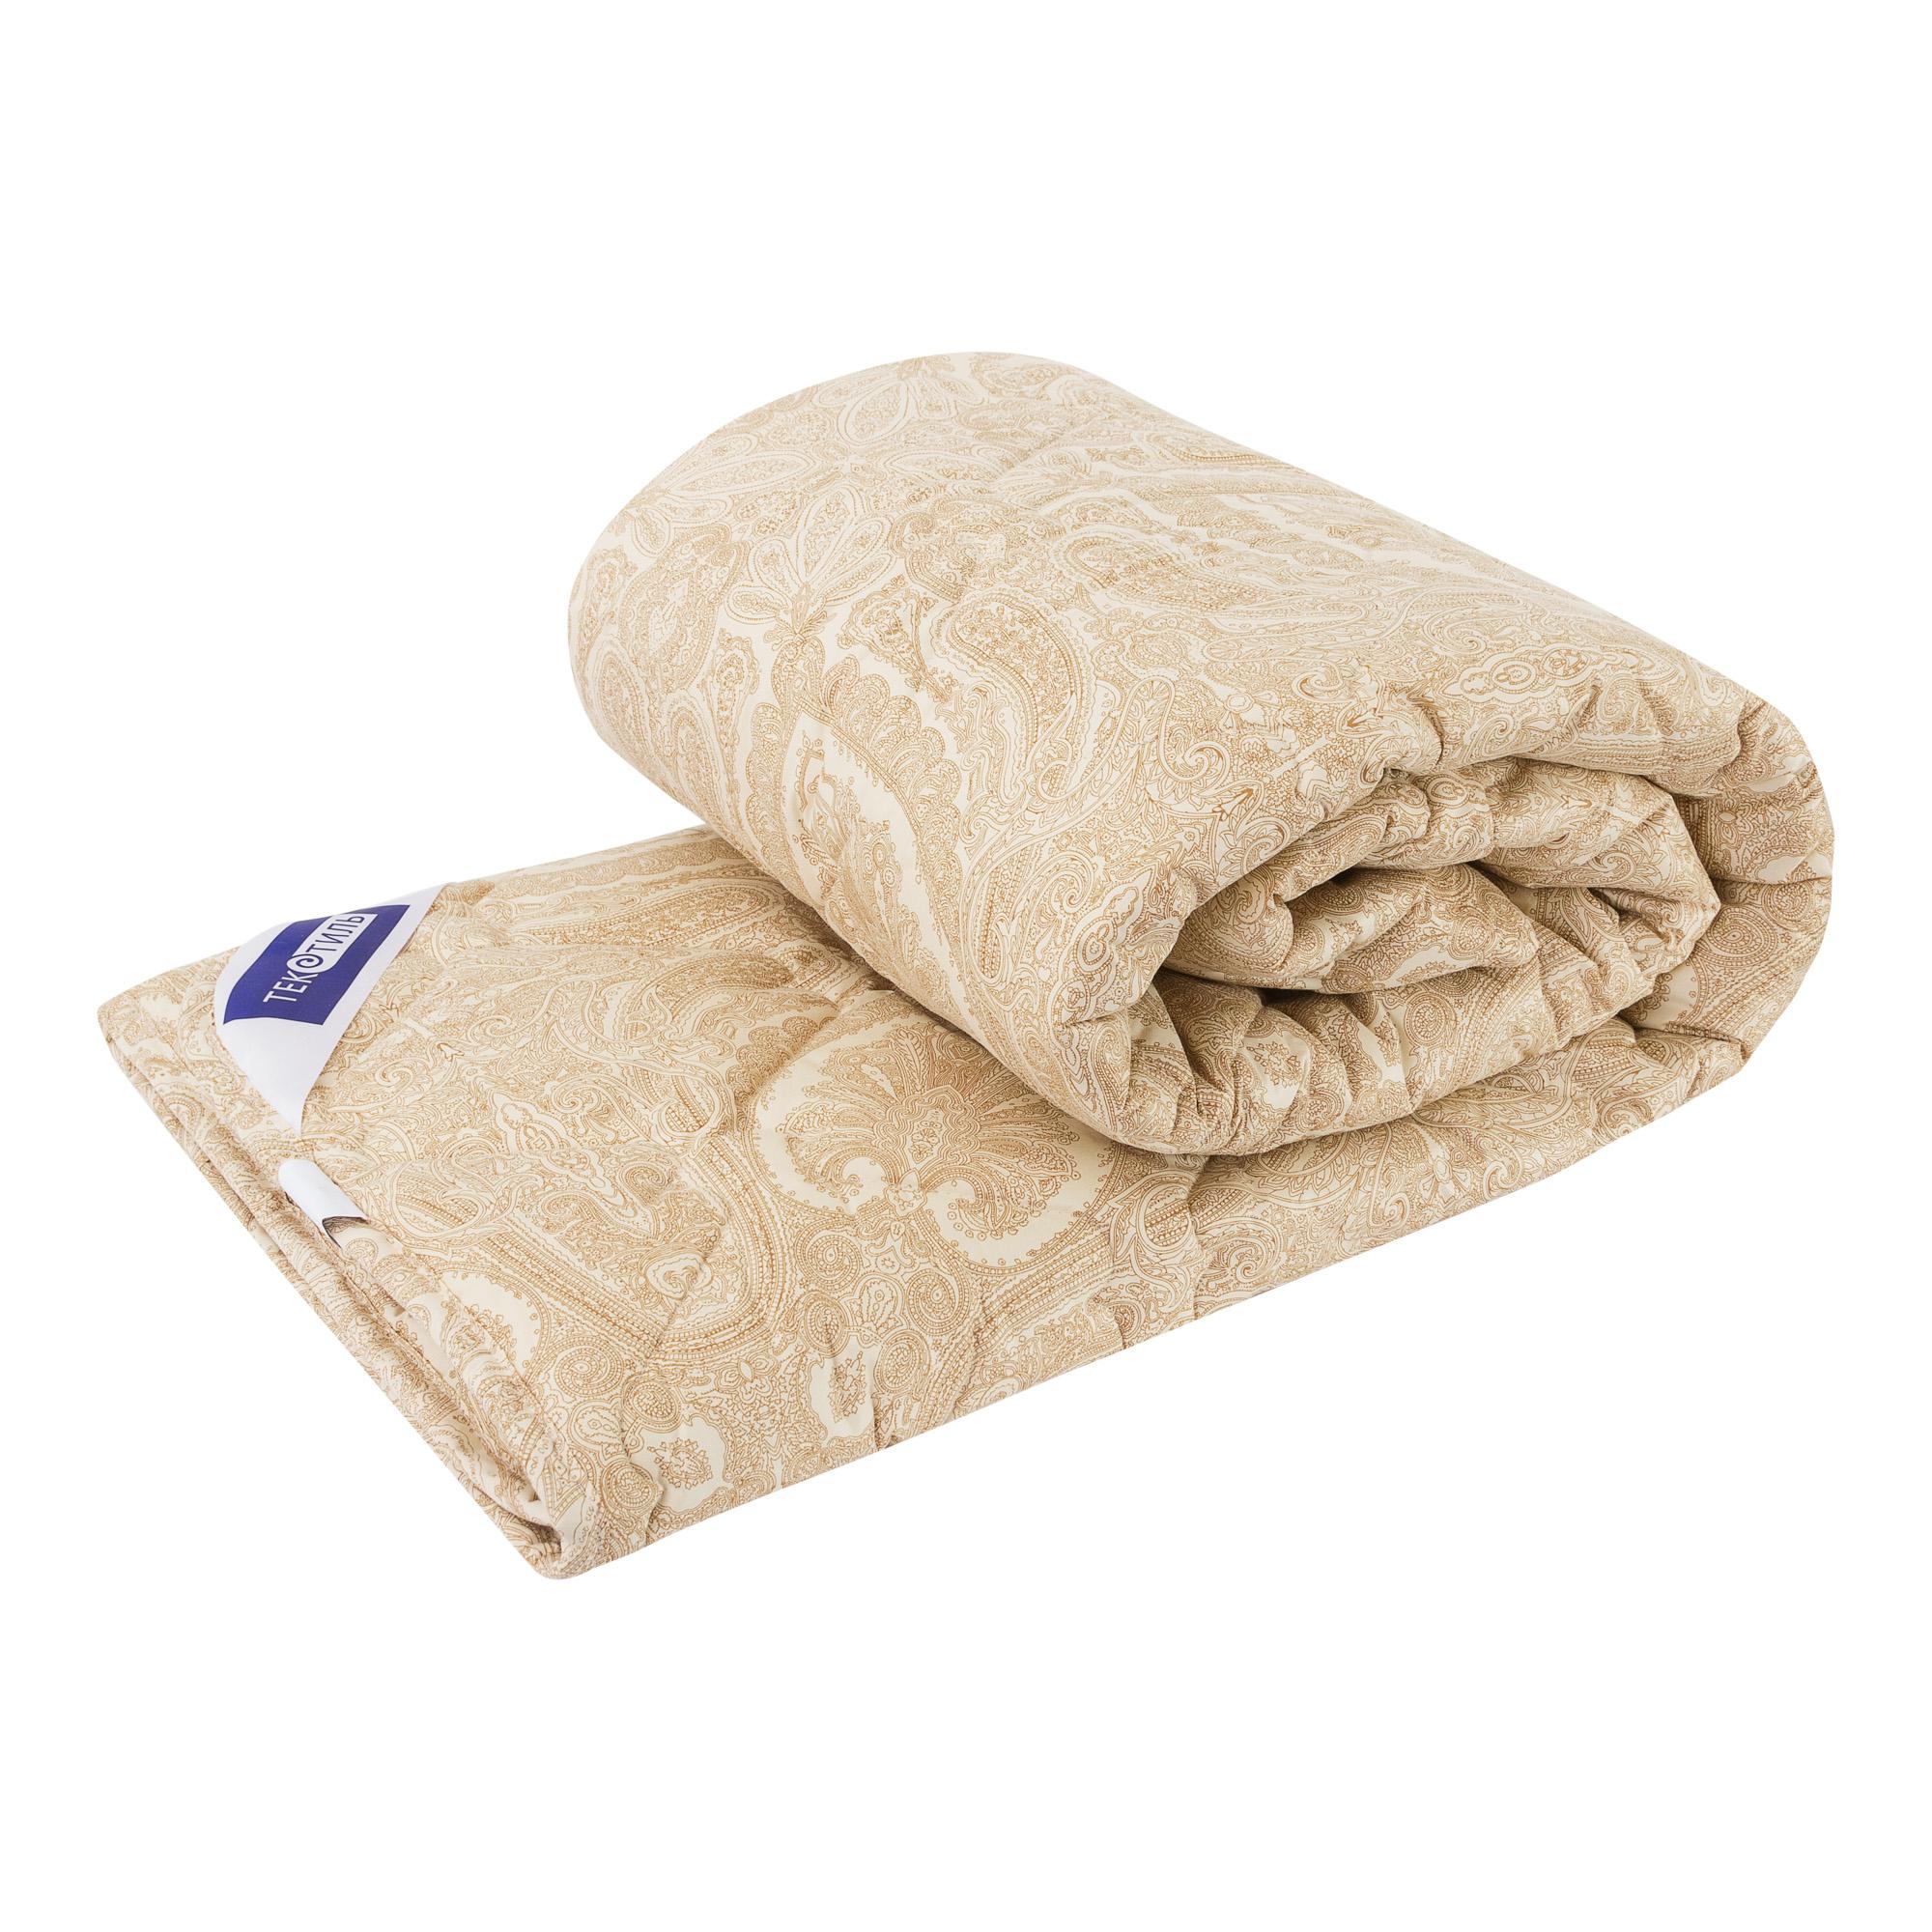 Одеяло ТекСтиль Кашемир, 170х205 одеяла la prima одеяло бабочки цвет голубой 170х205 см